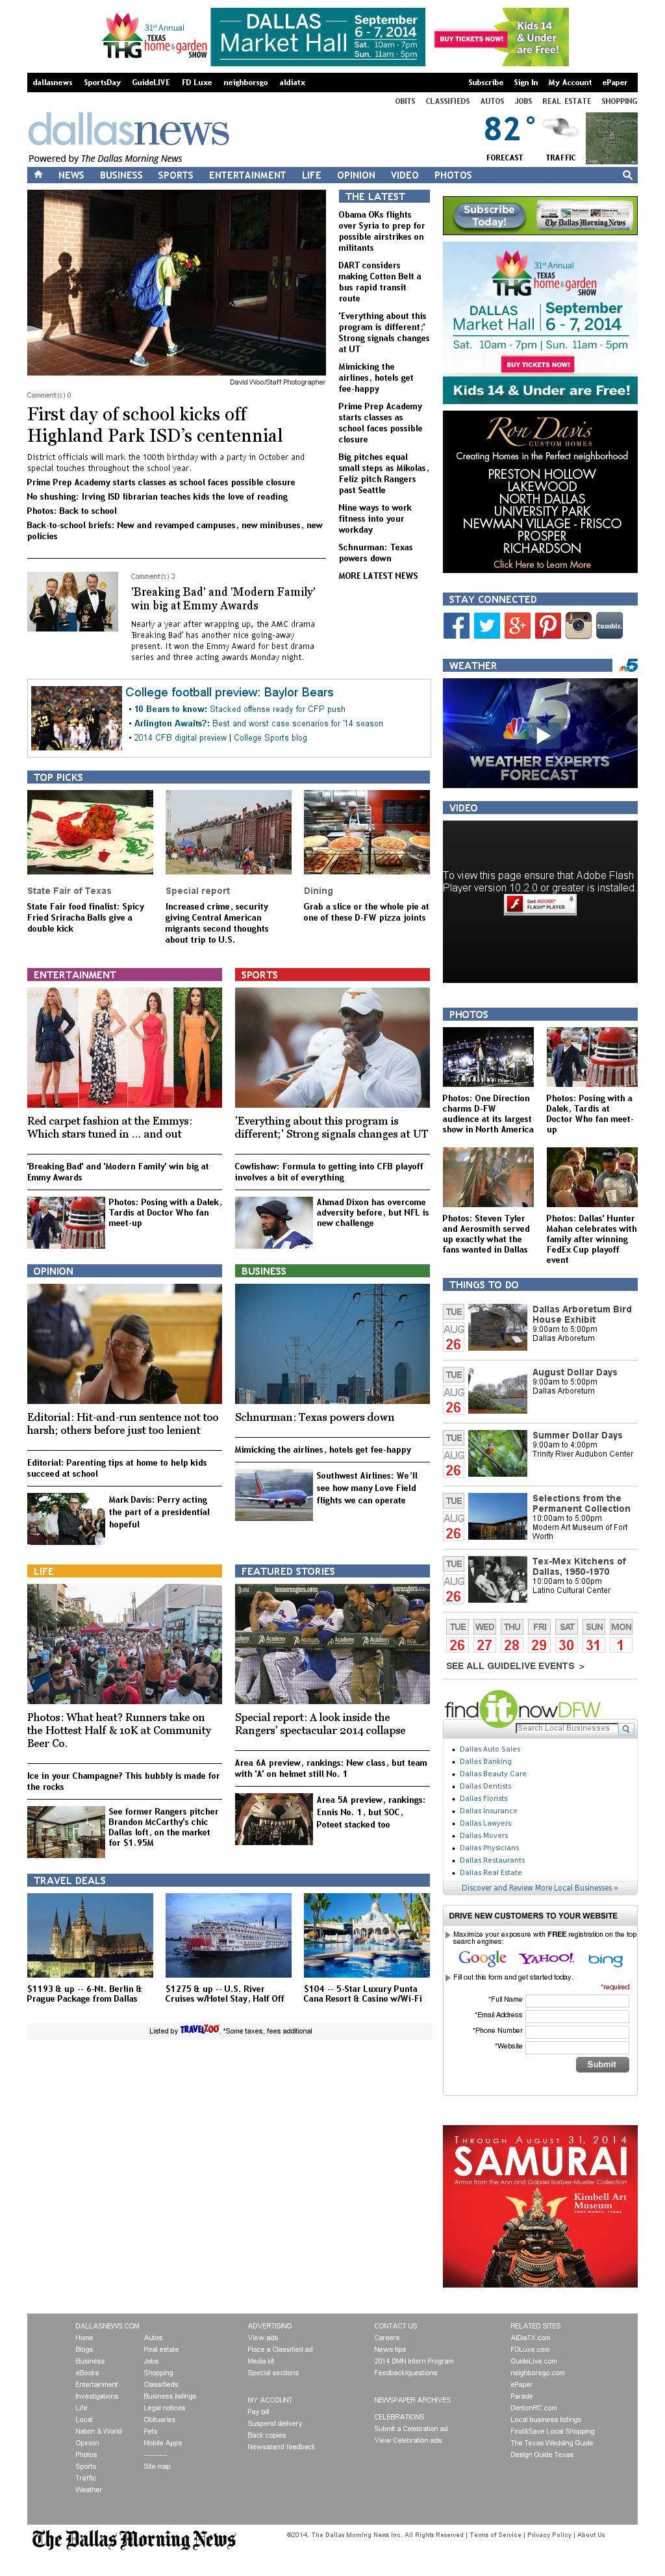 dallasnews.com at Tuesday Aug. 26, 2014, 10:03 a.m. UTC